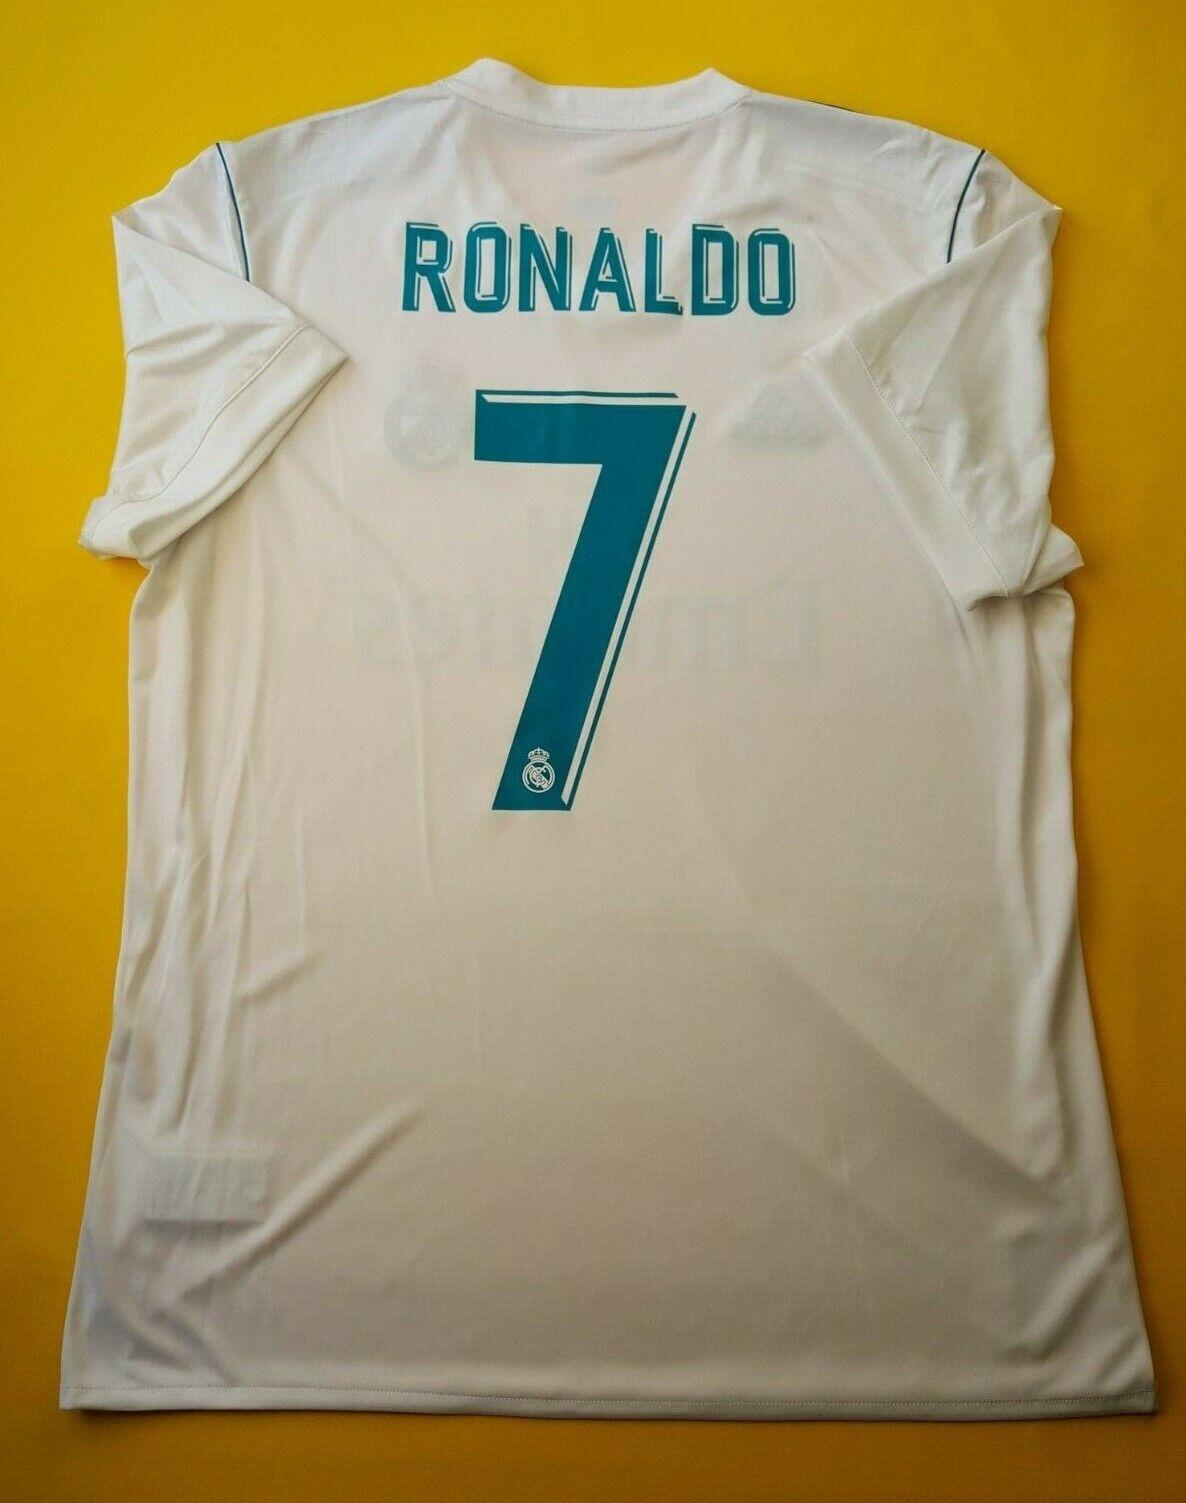 5+ 5 Ronaldo Real Madrid Jersey Camisa grande de 2018 AZ8059 Adidas Fútbol ig93